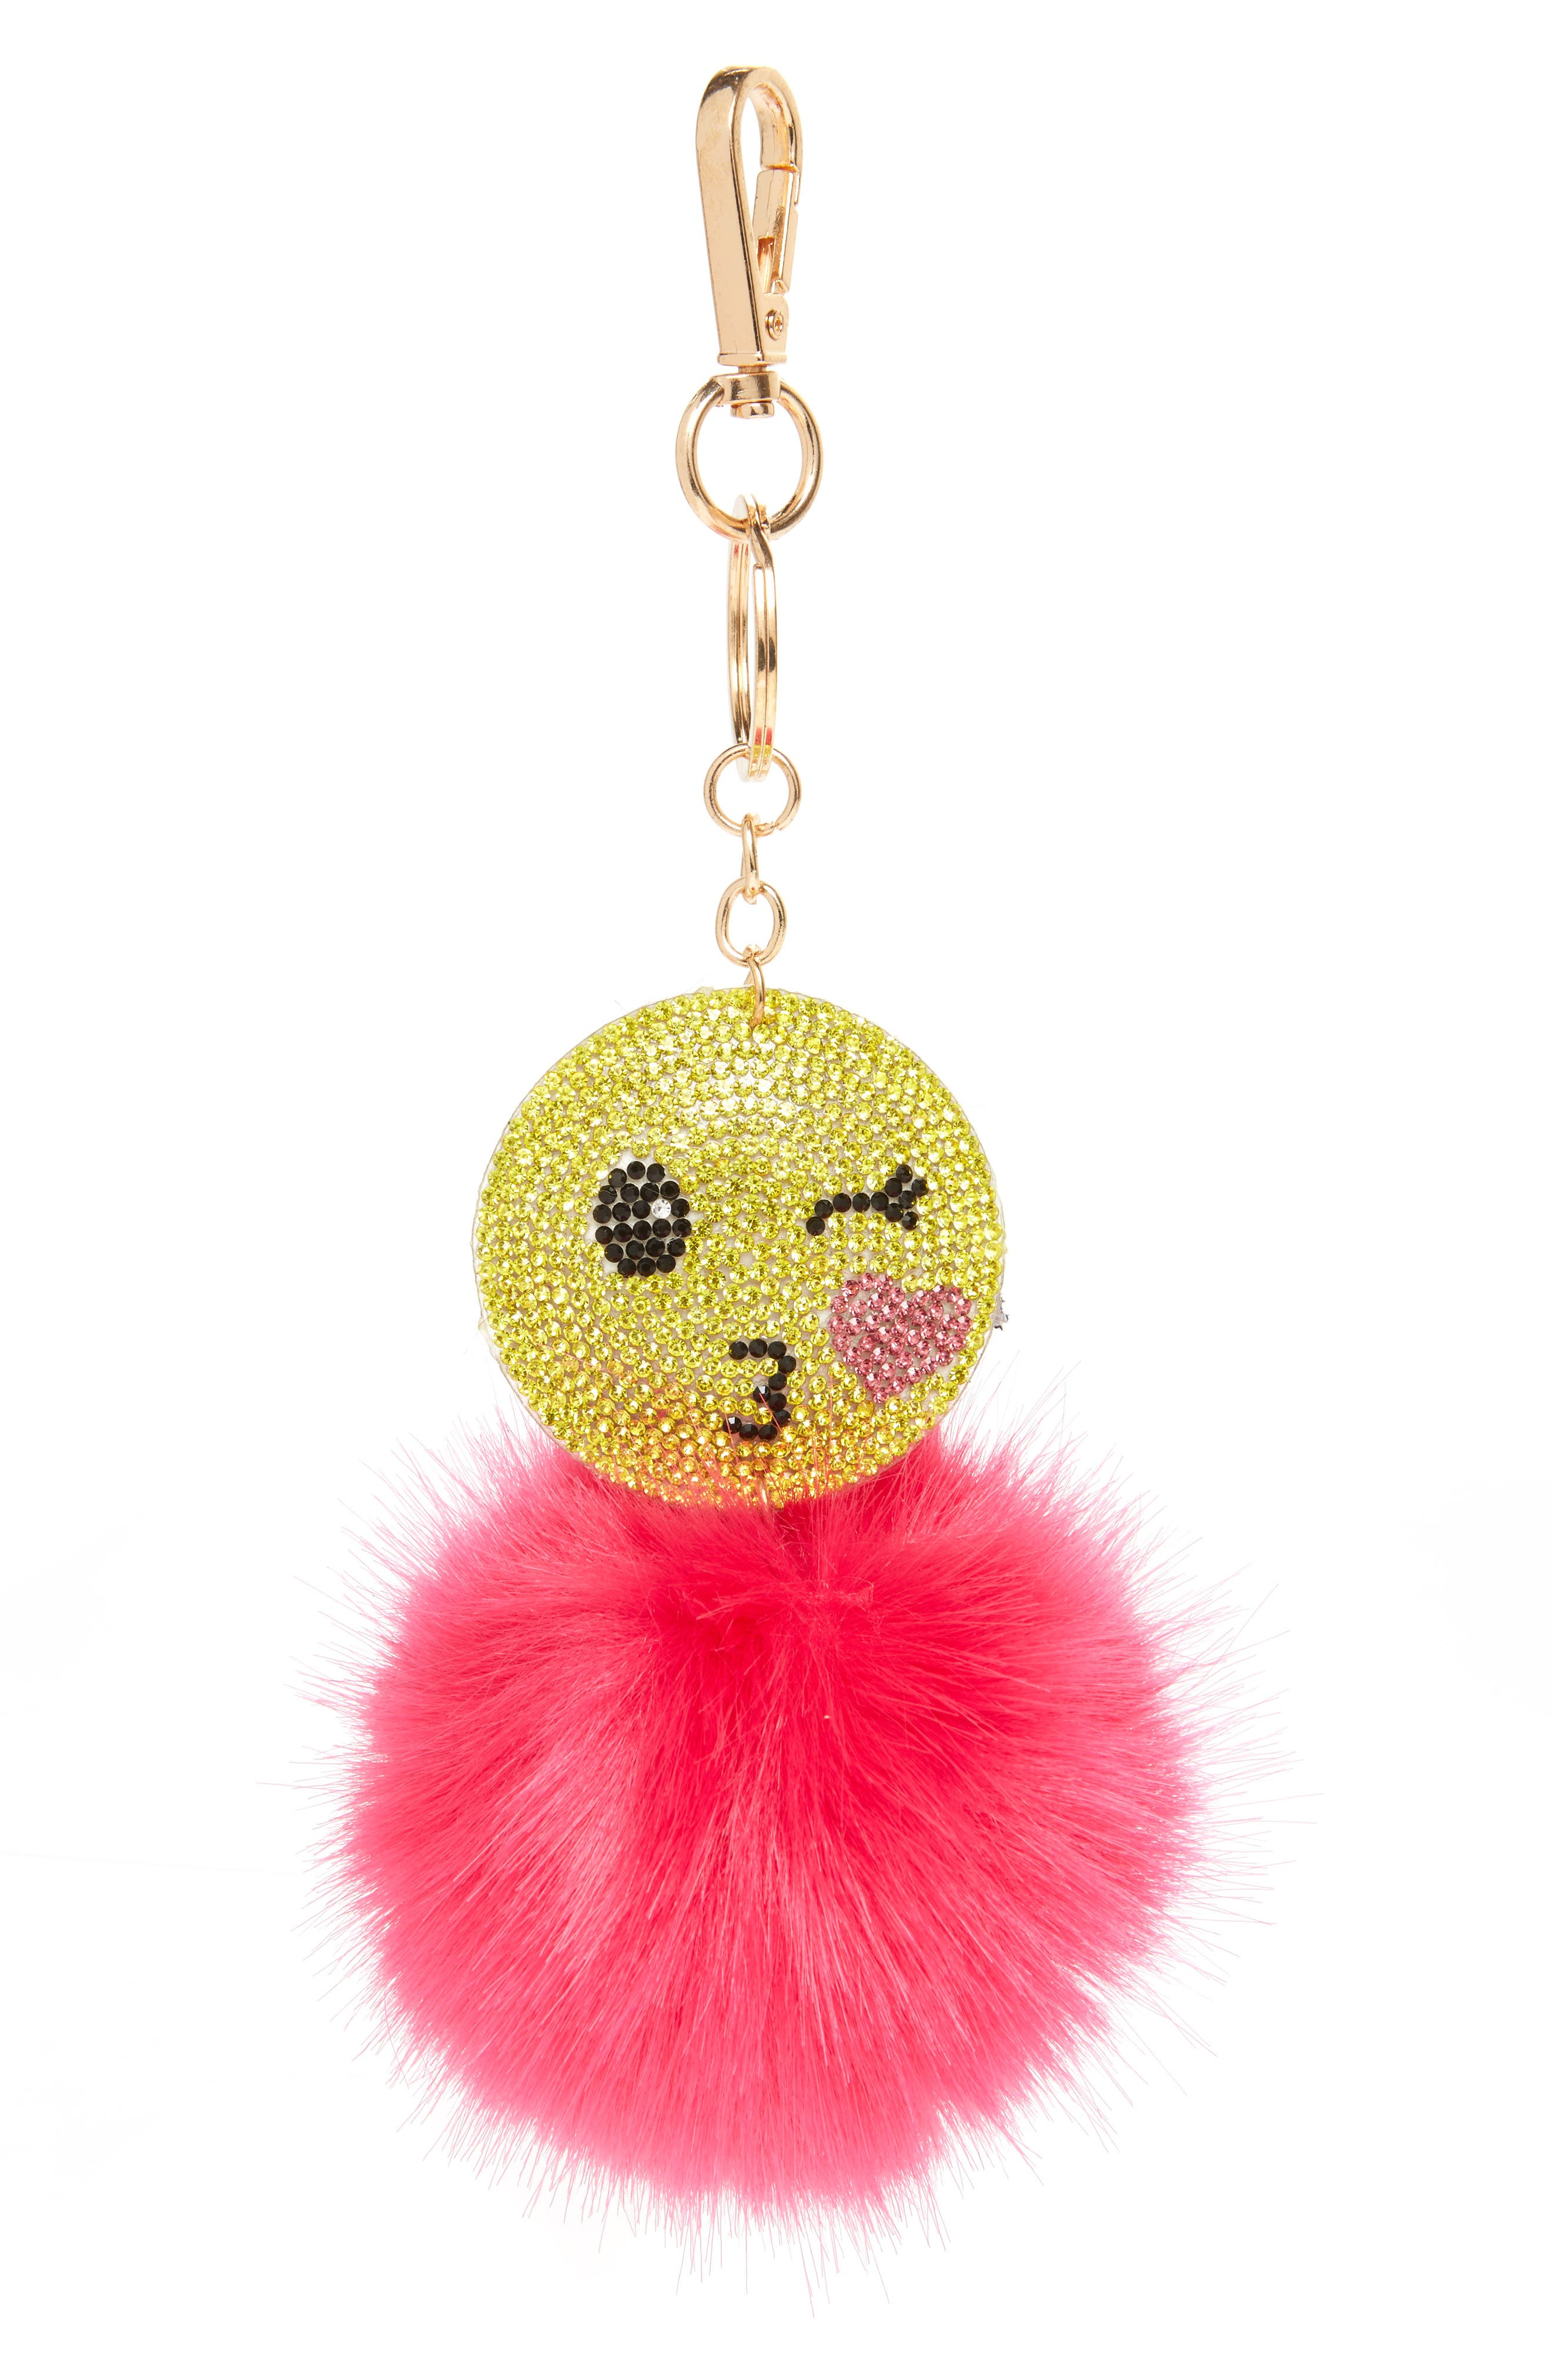 Wink Emoji Pom Faux Fur Bag Charm,                         Main,                         color, 650